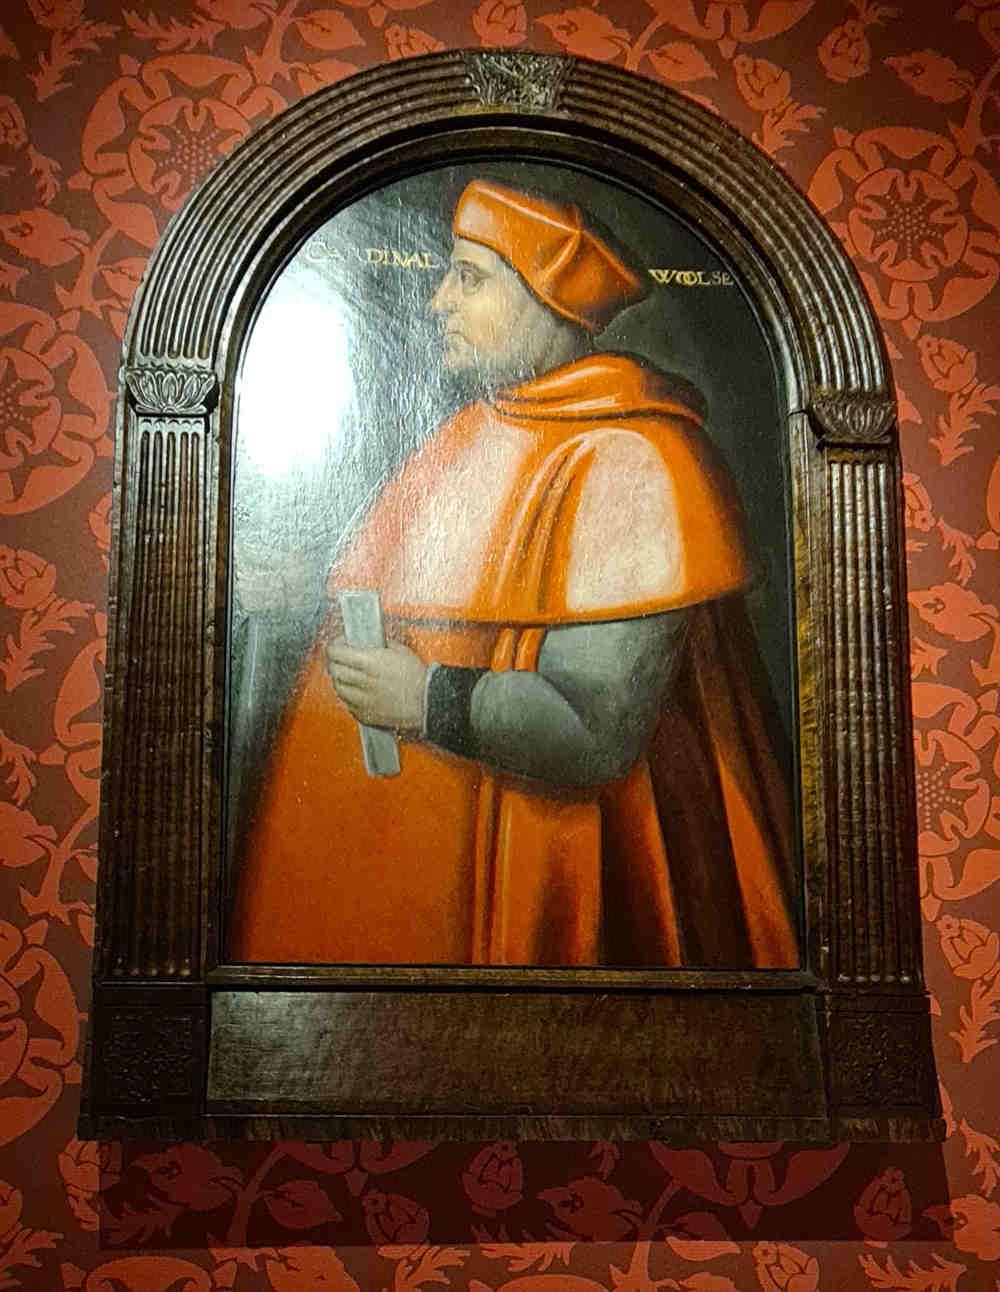 Cardinal Wosley portrait